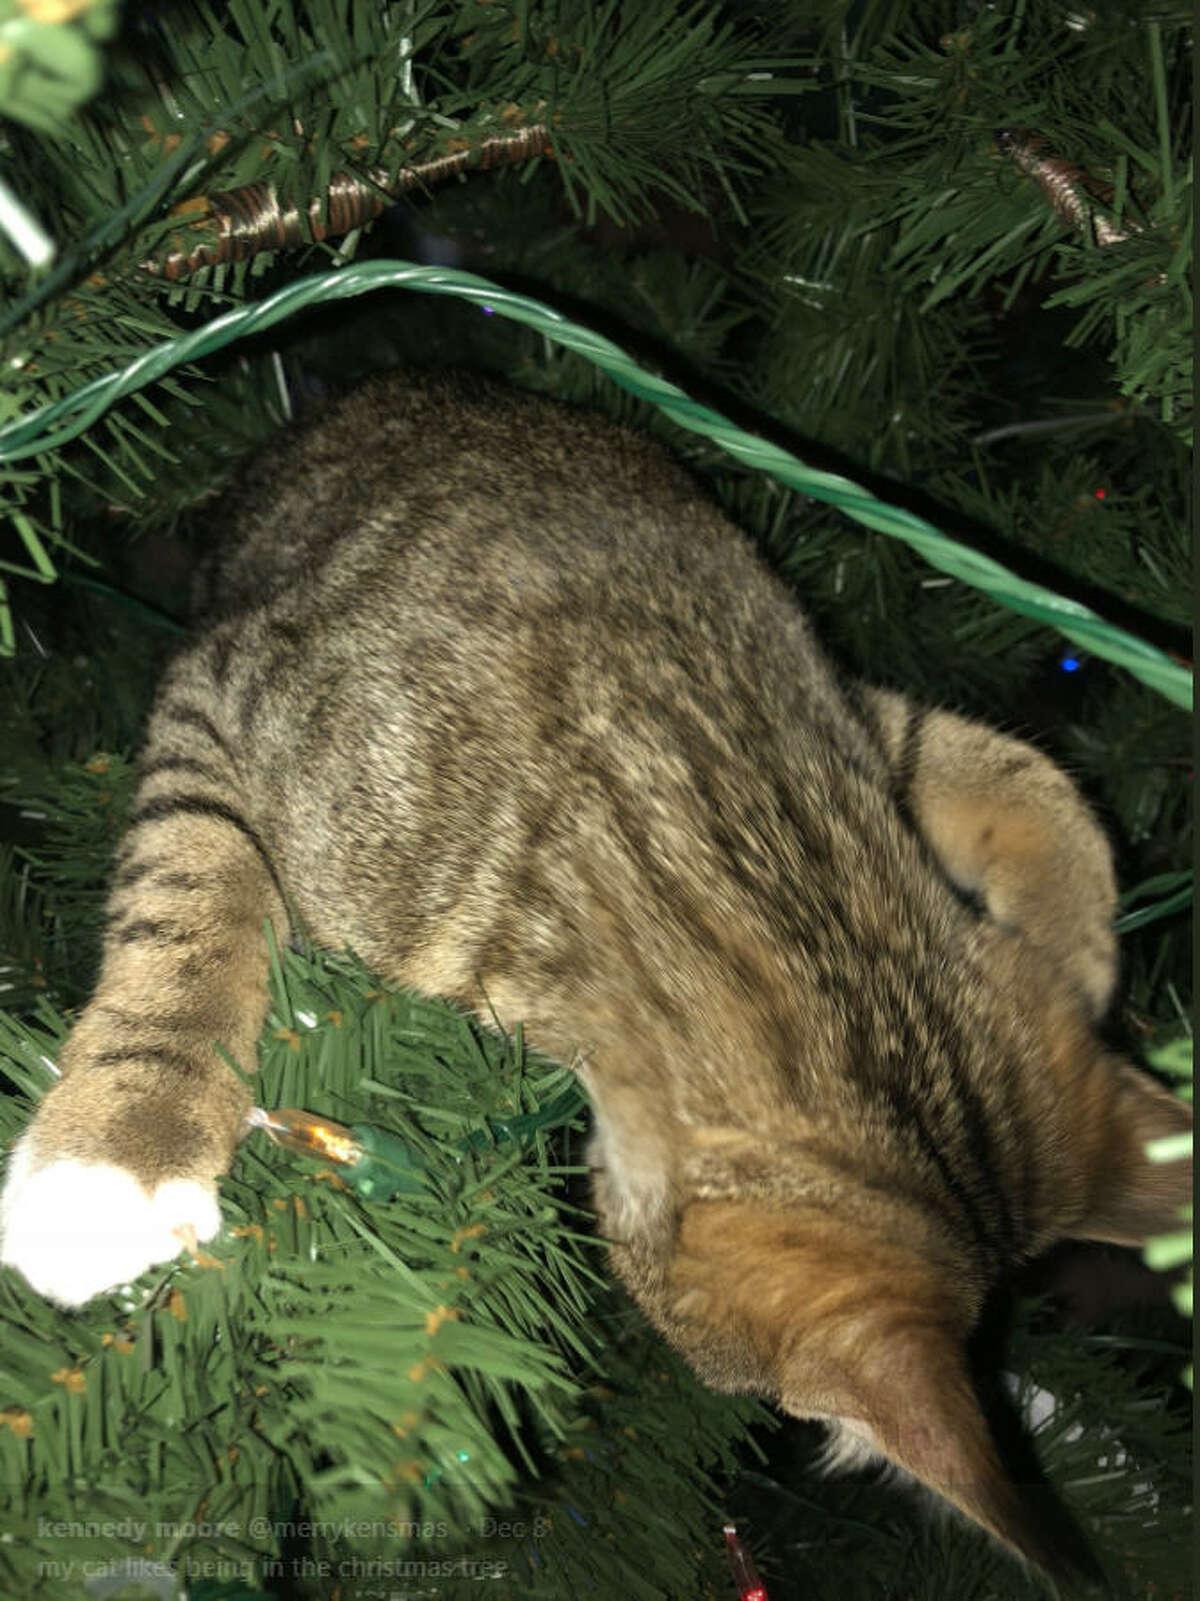 'Tis the season for cats climbing inside Christmas trees.